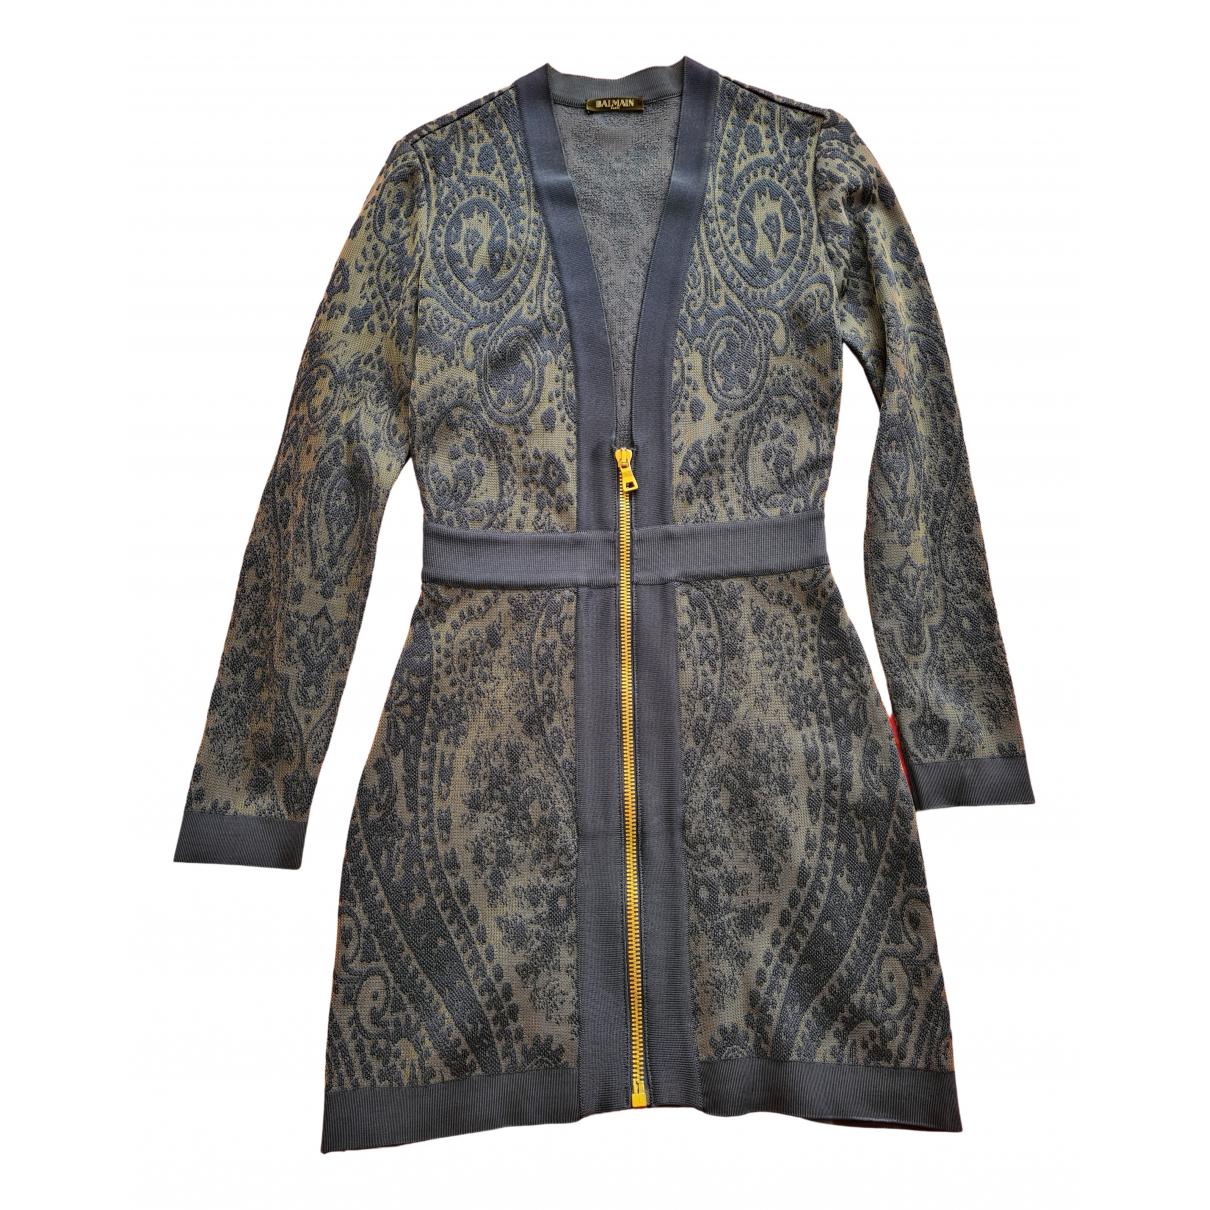 Balmain N Blue dress for Women M International